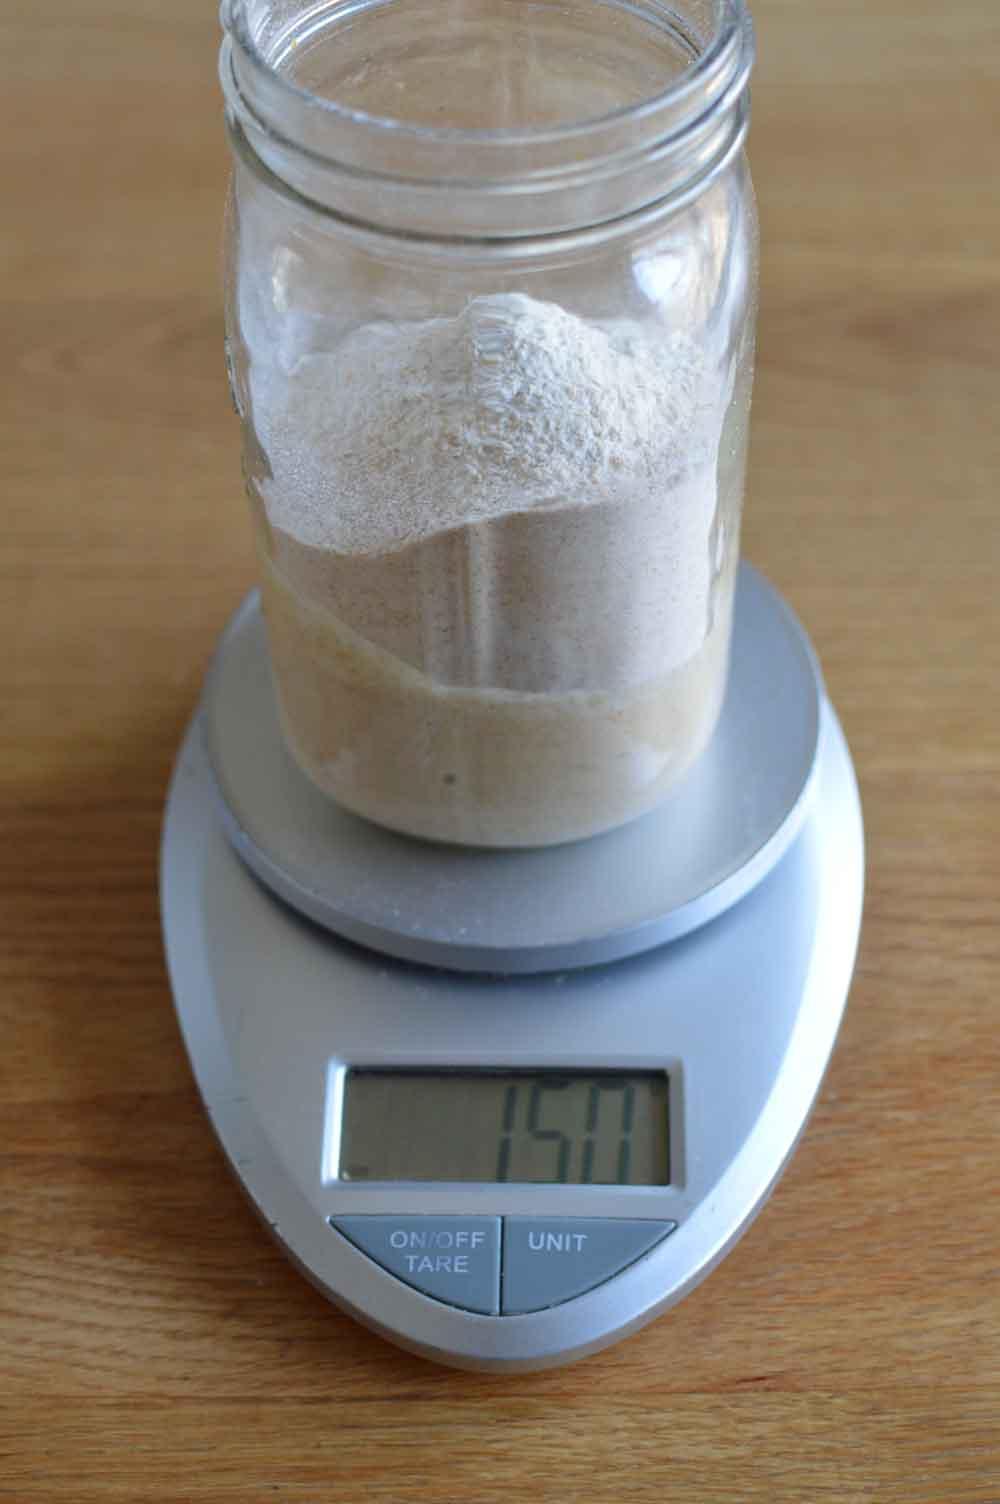 Adding-flour-to-feed-Sourdough-Starter.jpg